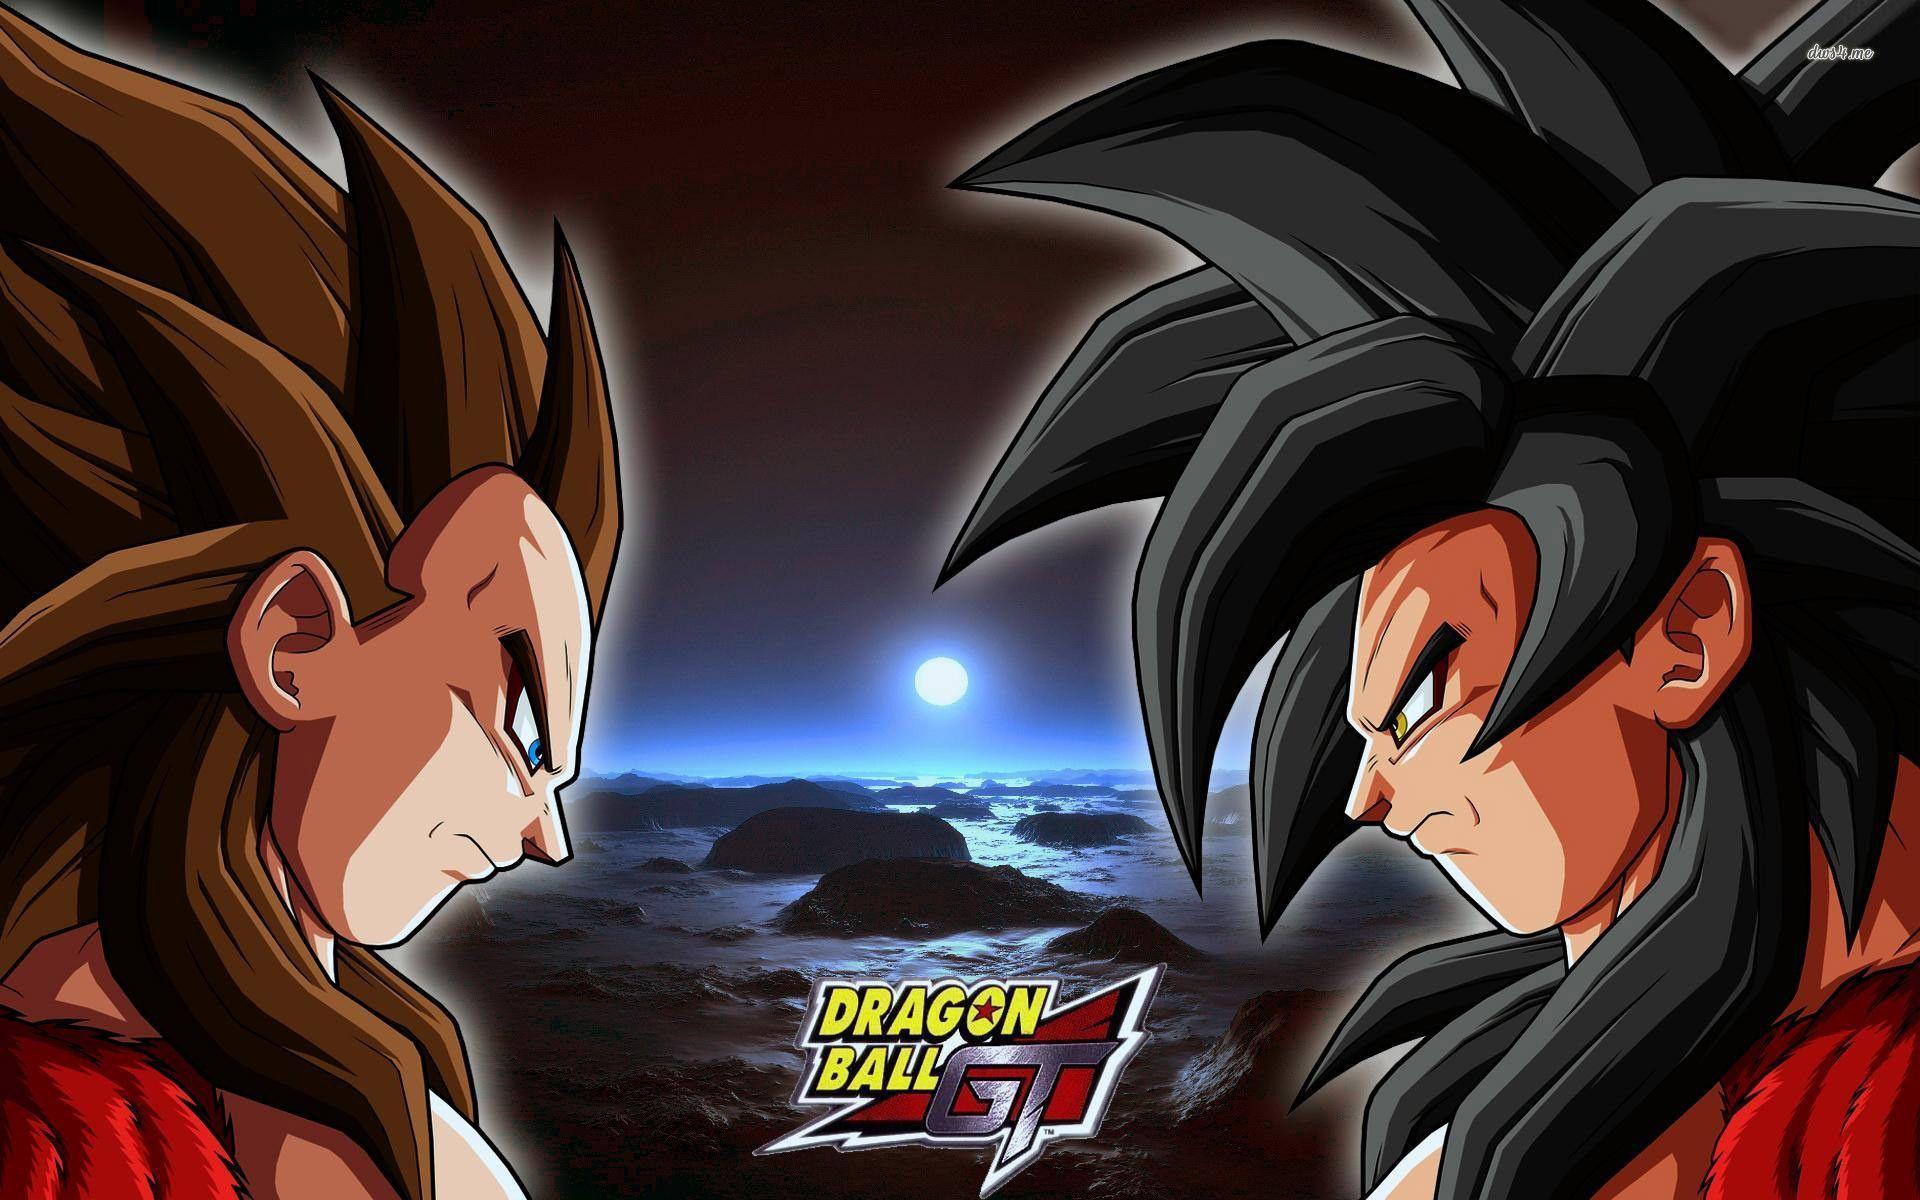 Dragon Ball Gt Wallpapers Top Free Dragon Ball Gt Backgrounds Wallpaperaccess